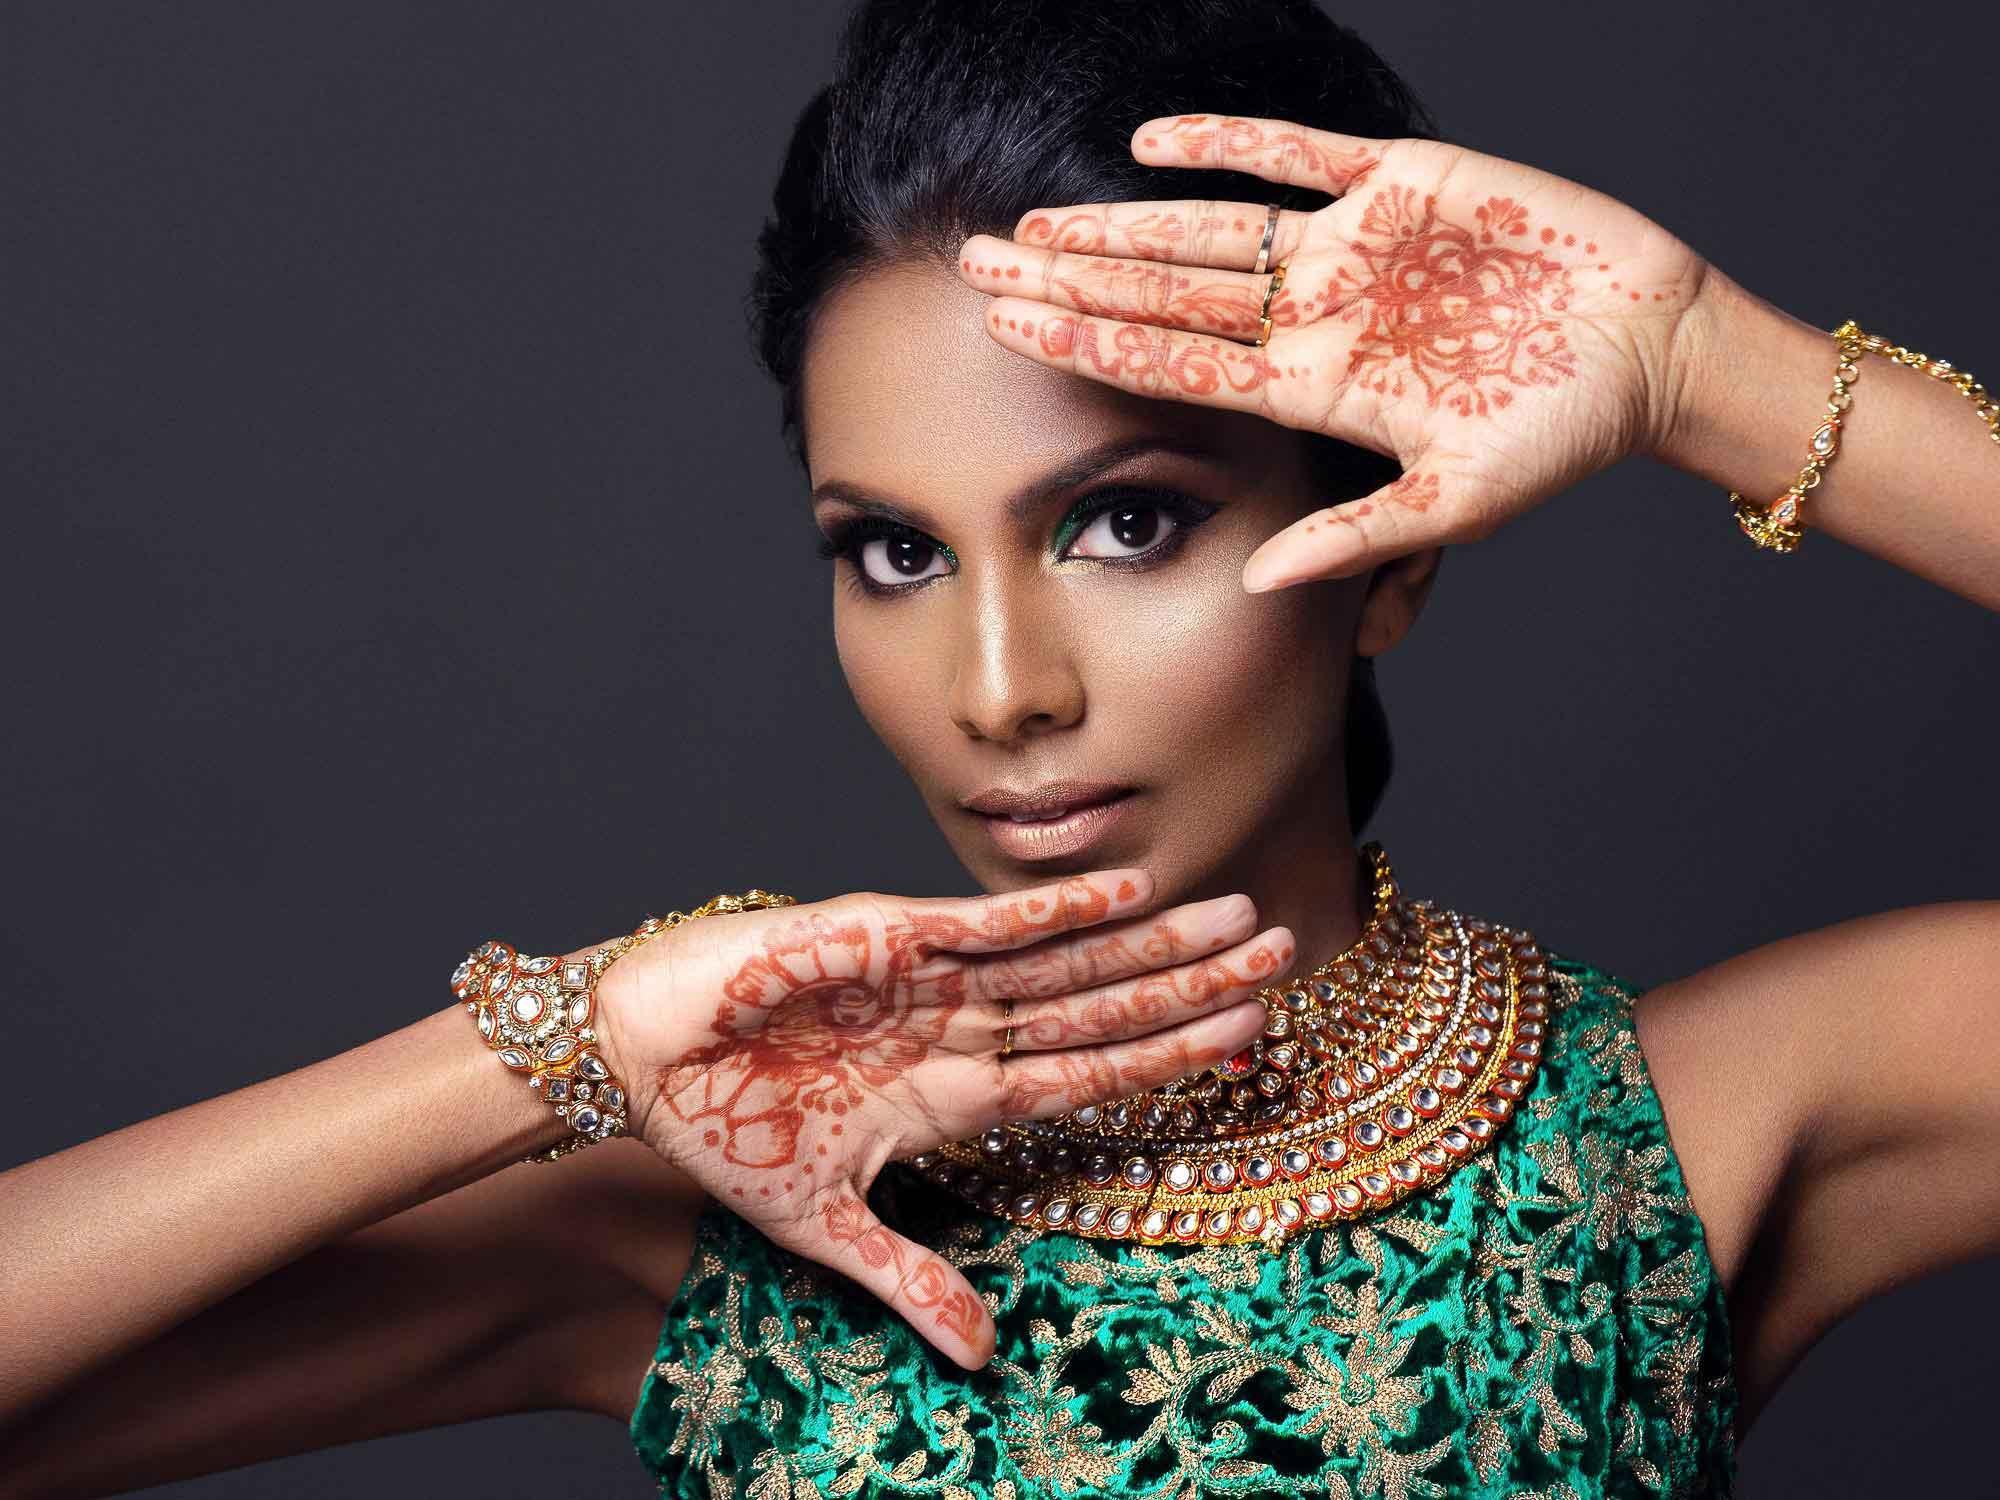 Fashion Photography Beauty Portrait Photographer Jose Jeuland 2